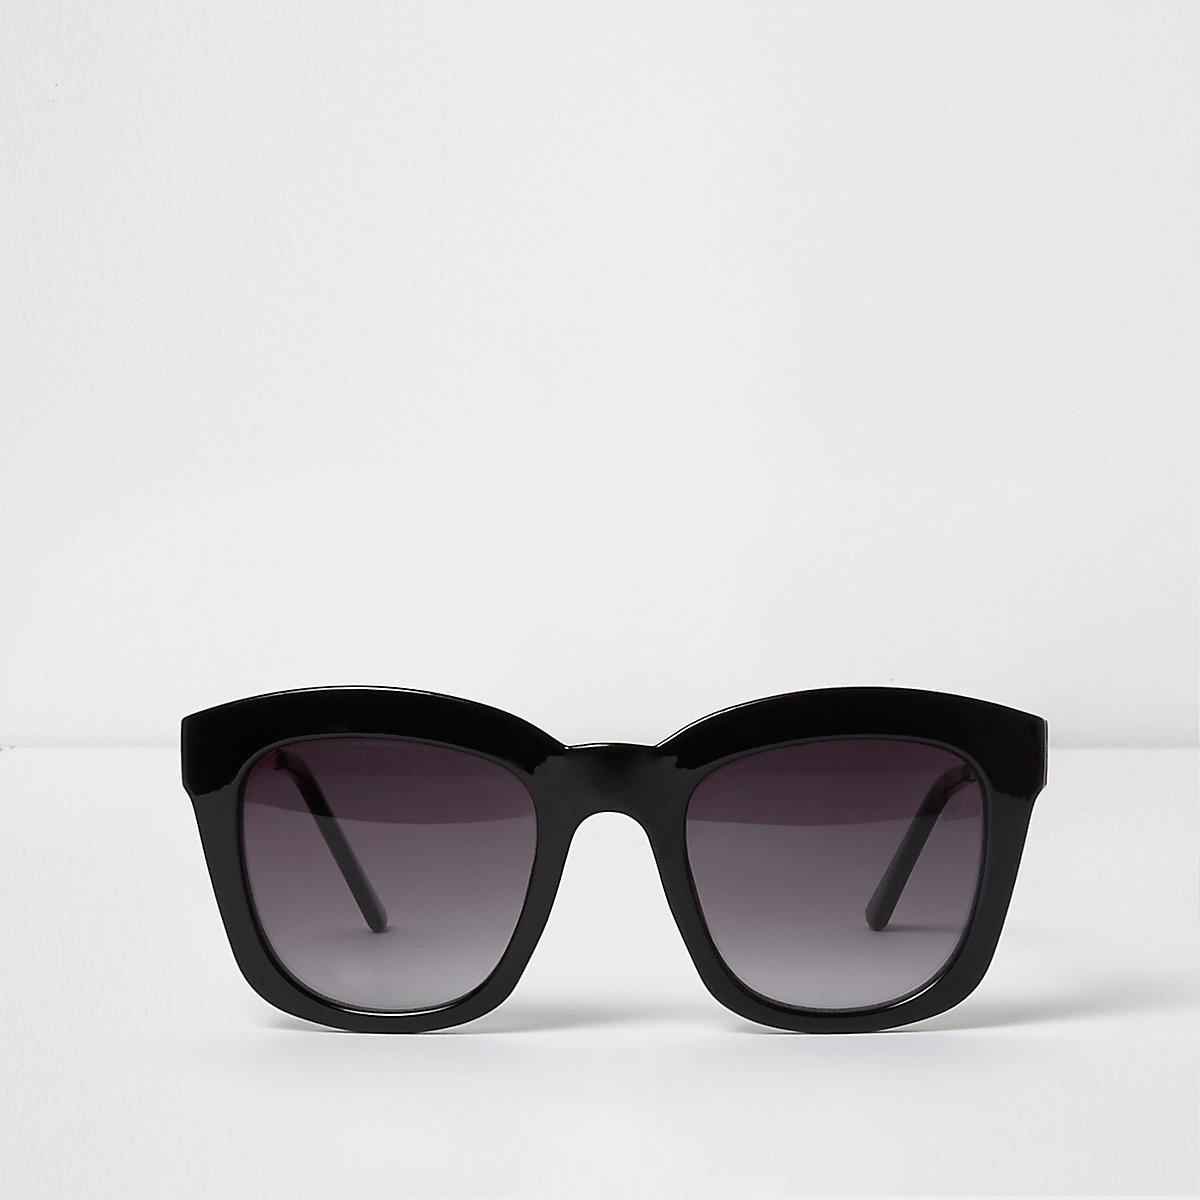 d0750ace216 Black oversized glam smoke lens sunglasses - Oversized Sunglasses -  Sunglasses - women